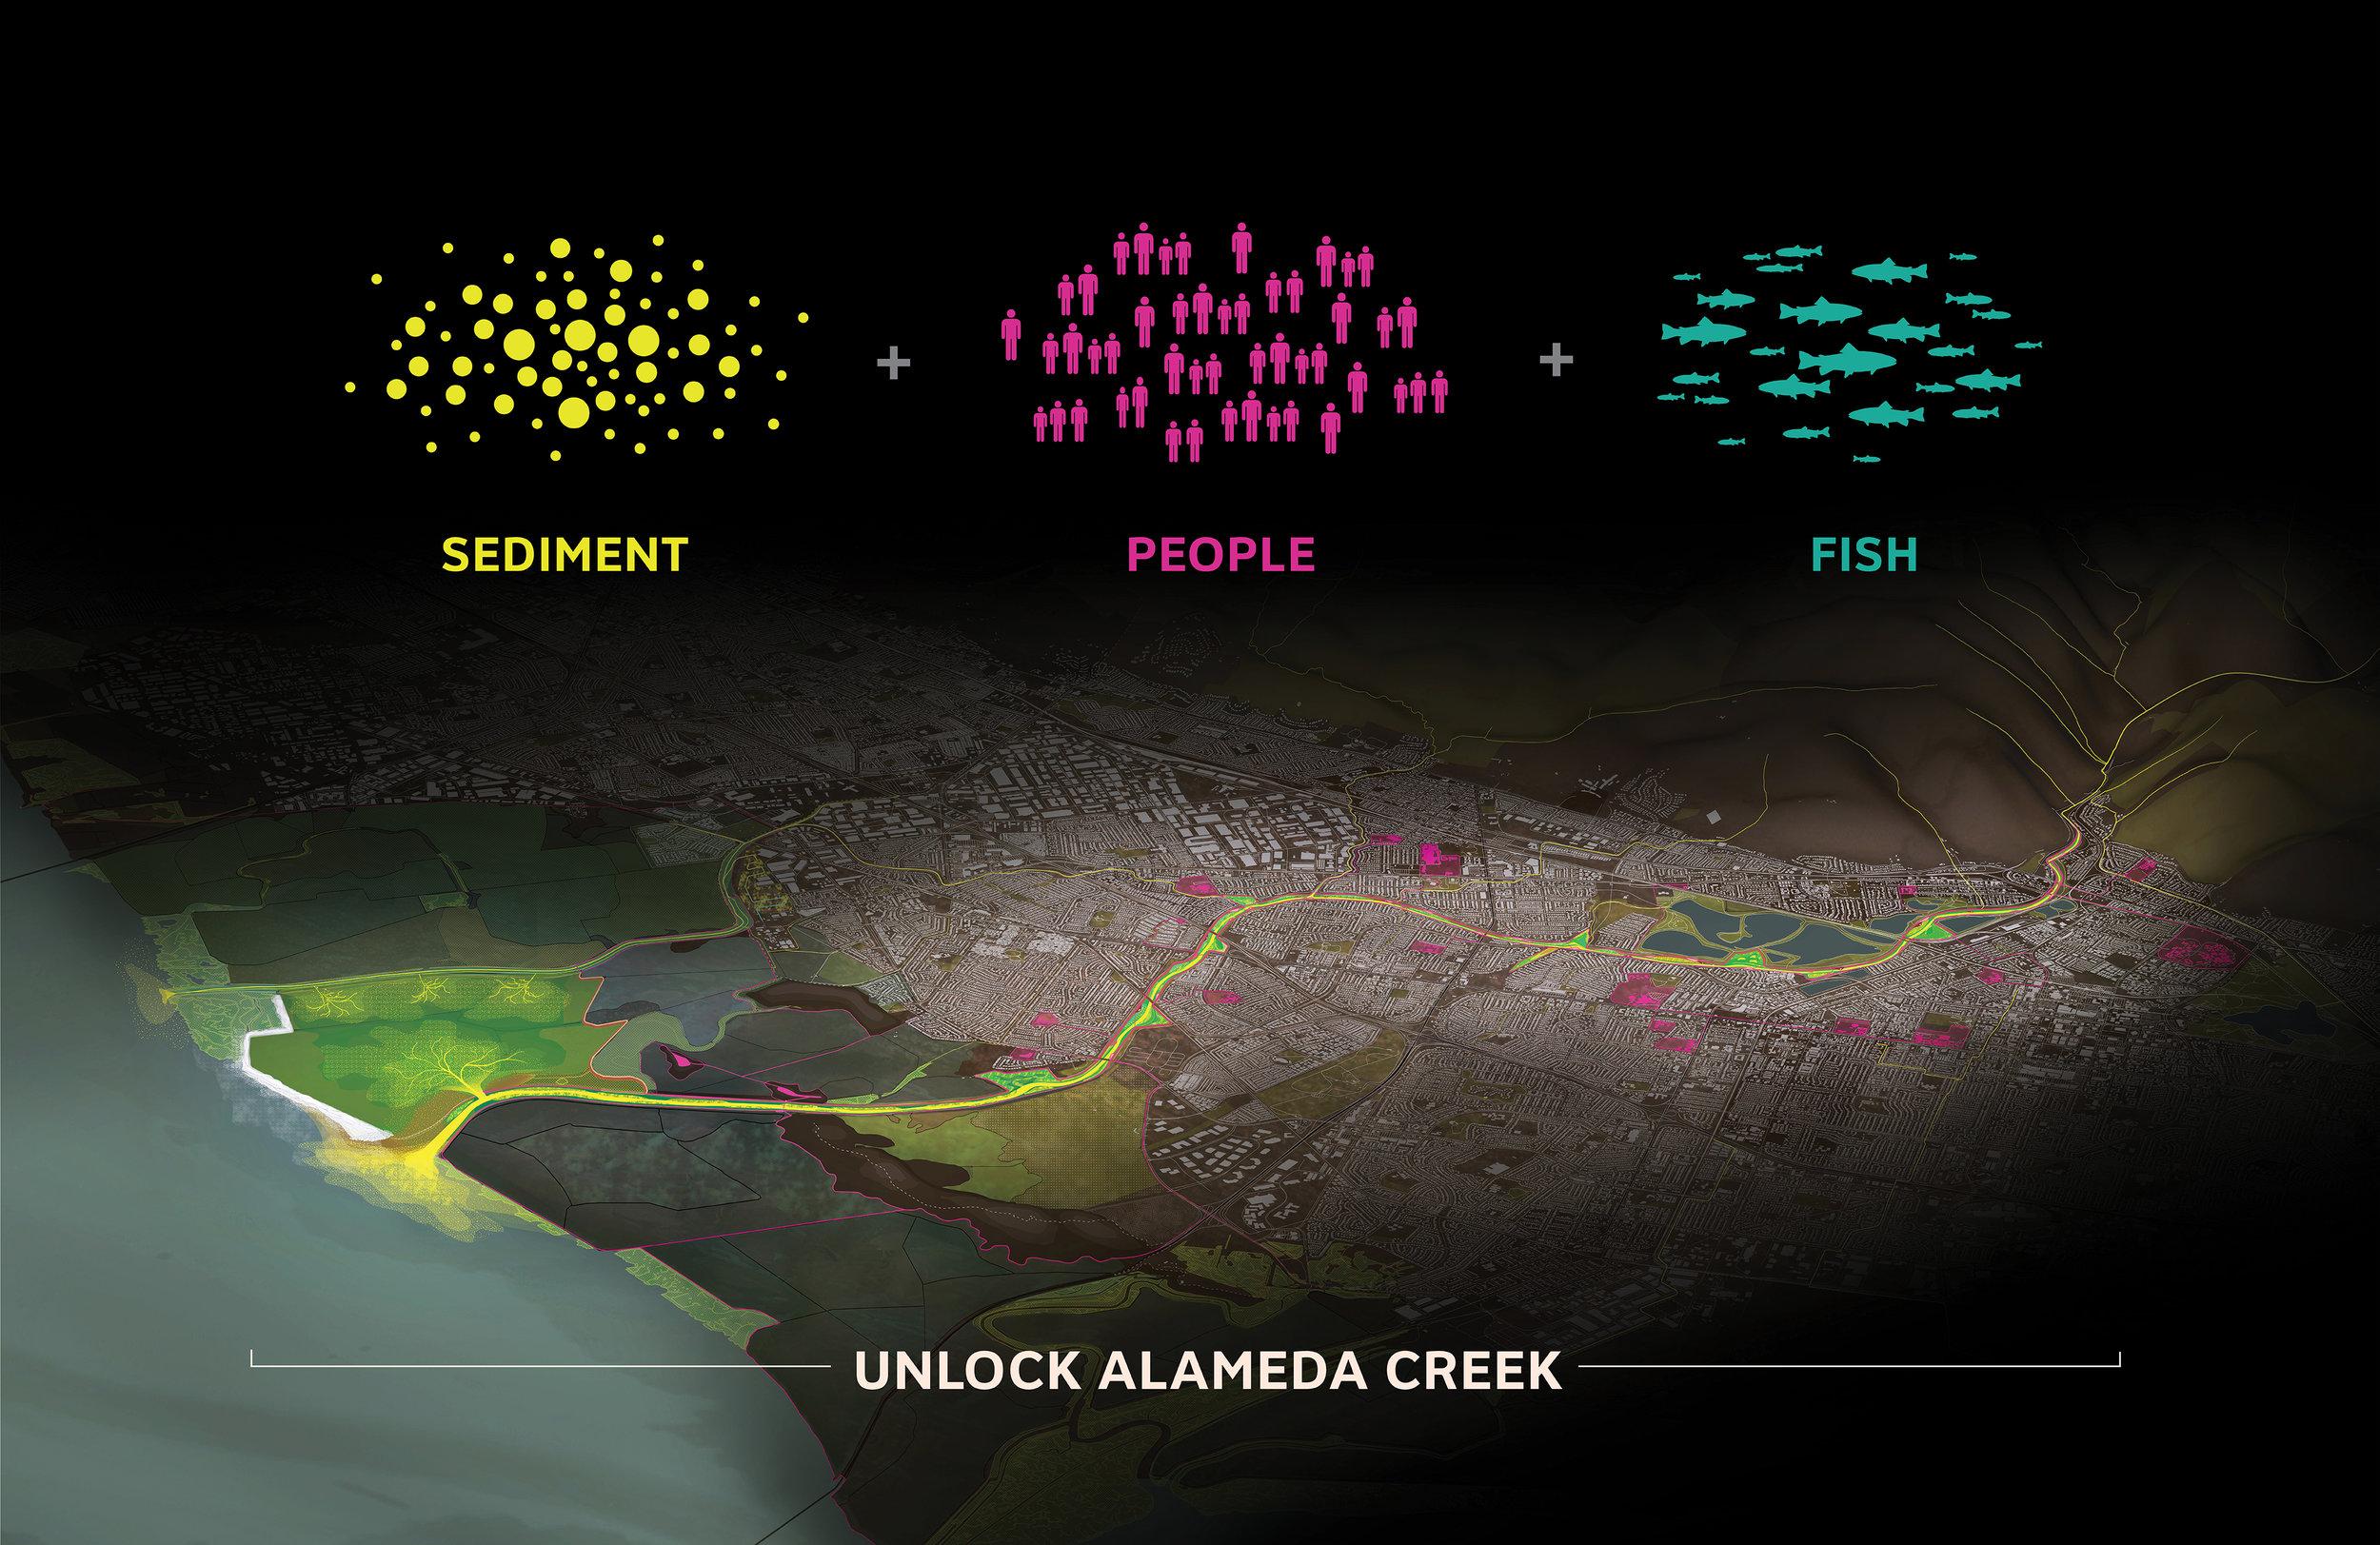 Public Sediment for Alameda Creek Press Images.jpg